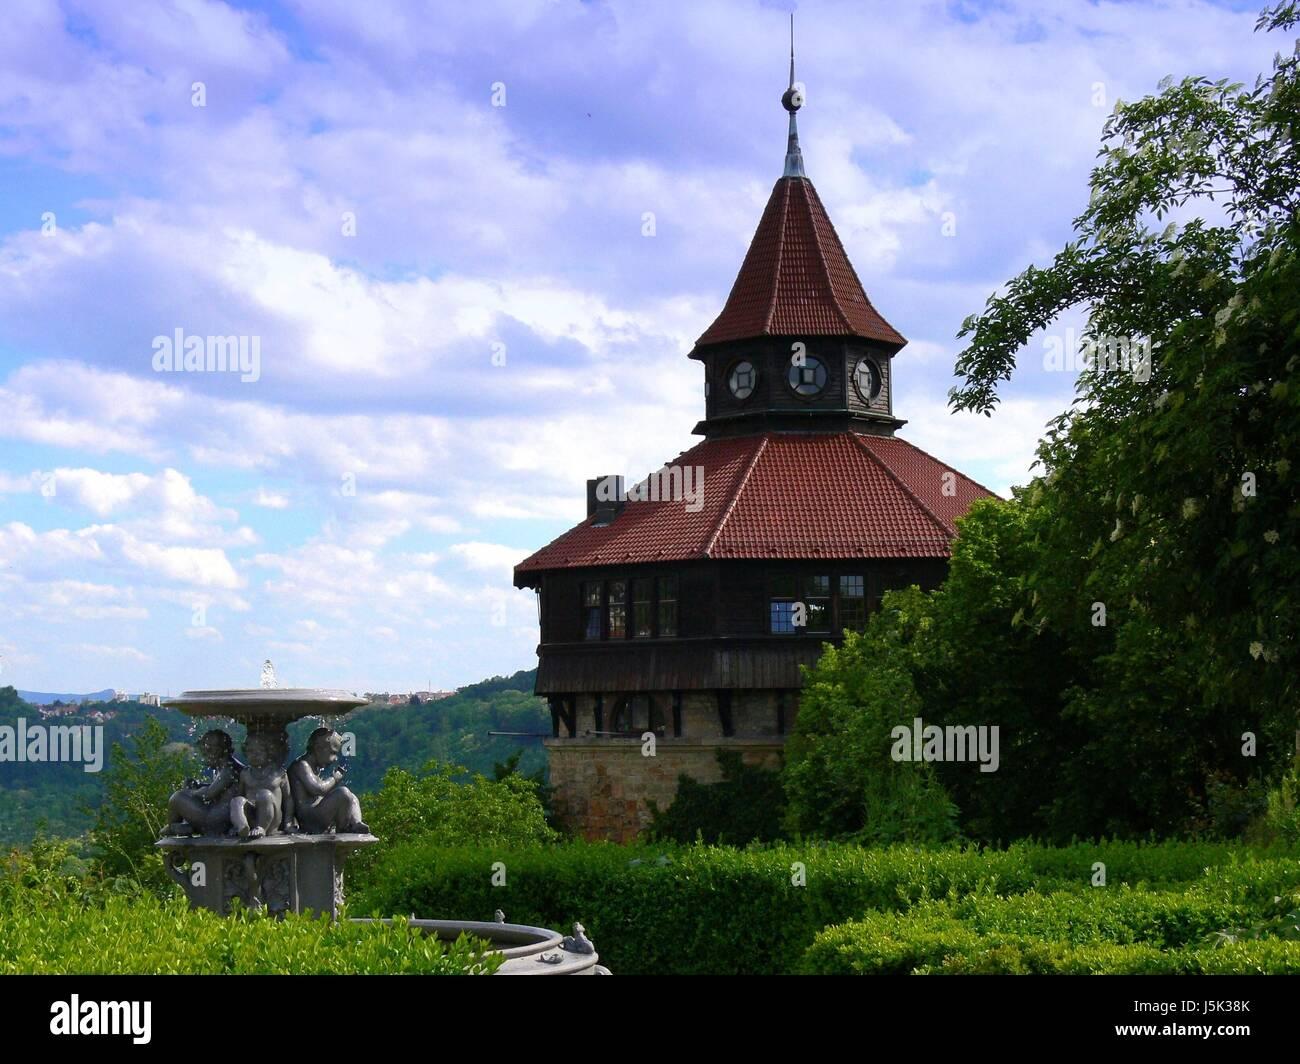 Historischen Garten Brunnen Turm Gärten Schloss Burg Esslingen